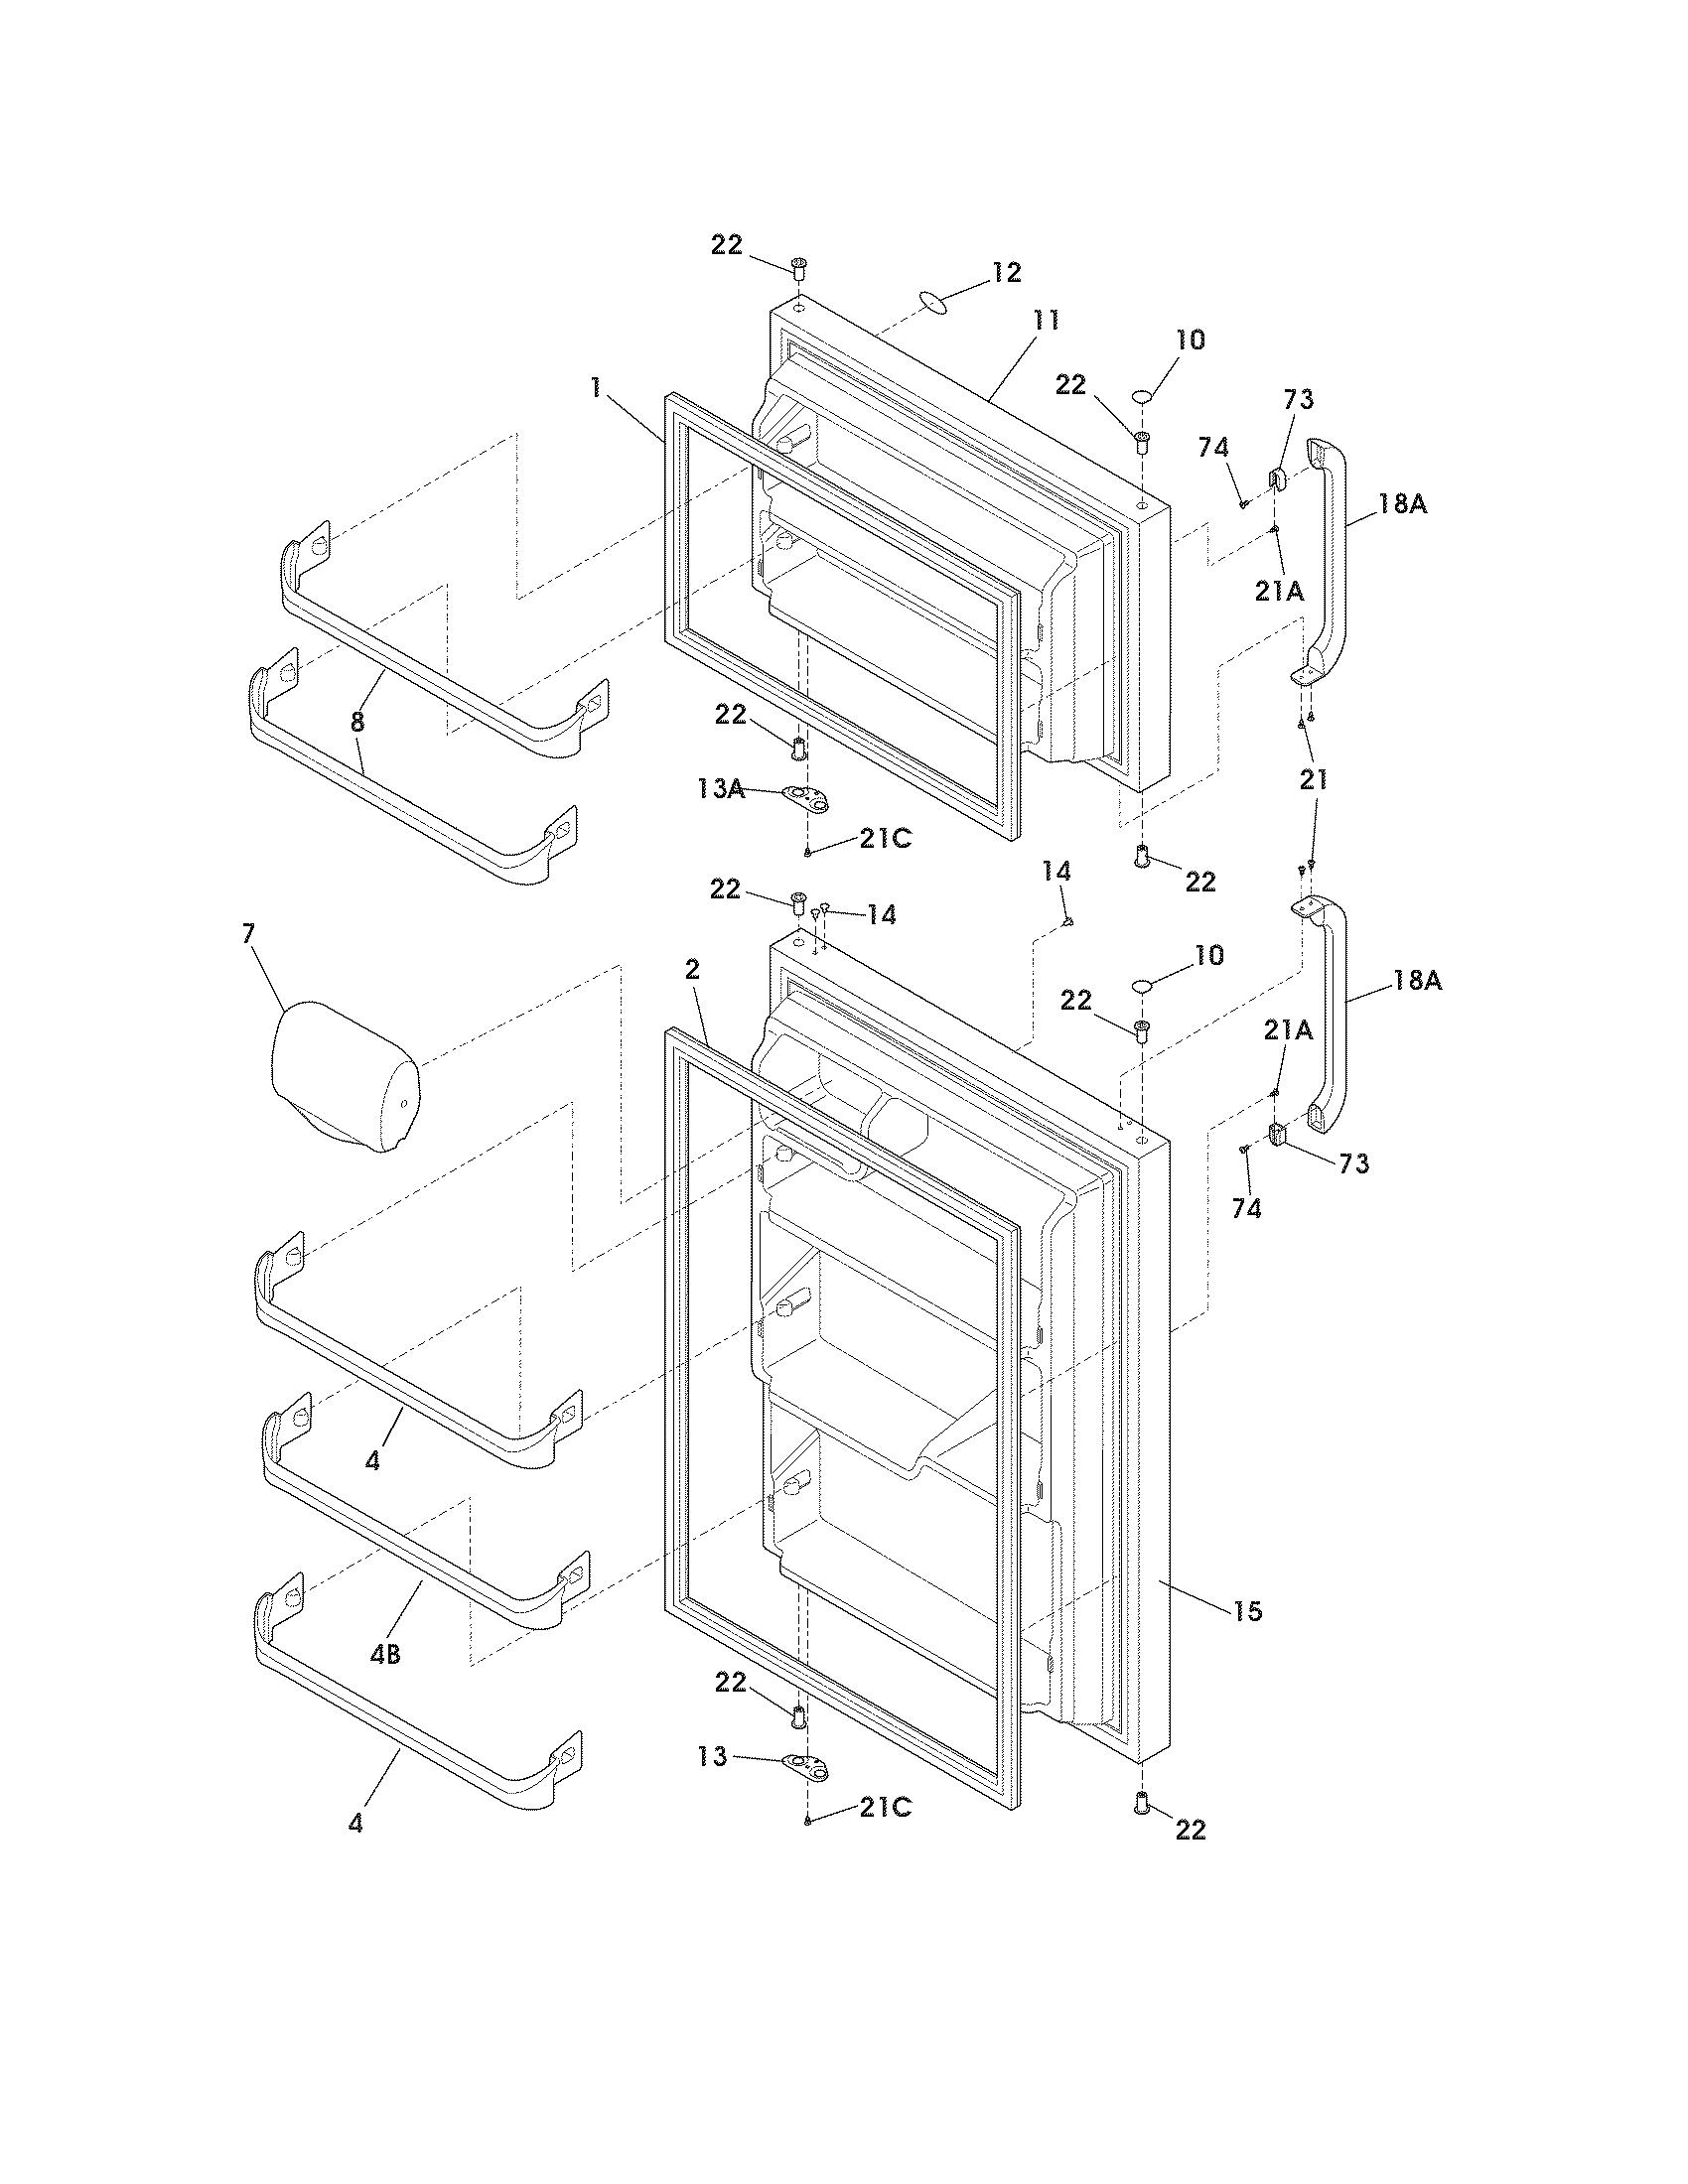 crosley crte181aw5 freezer door seal-gasket  white